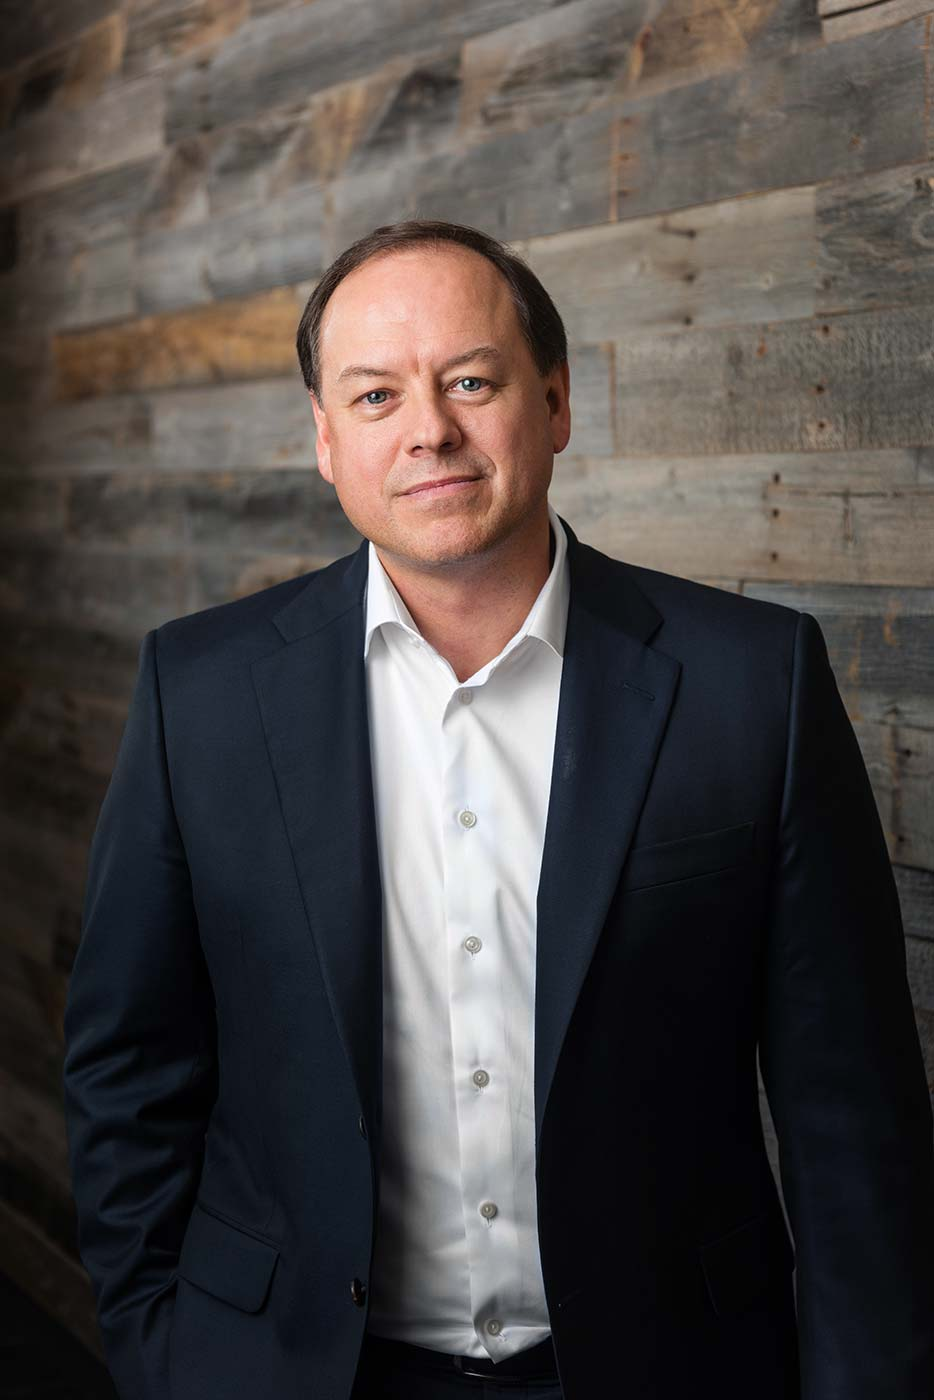 Executive Headshots San Antonio